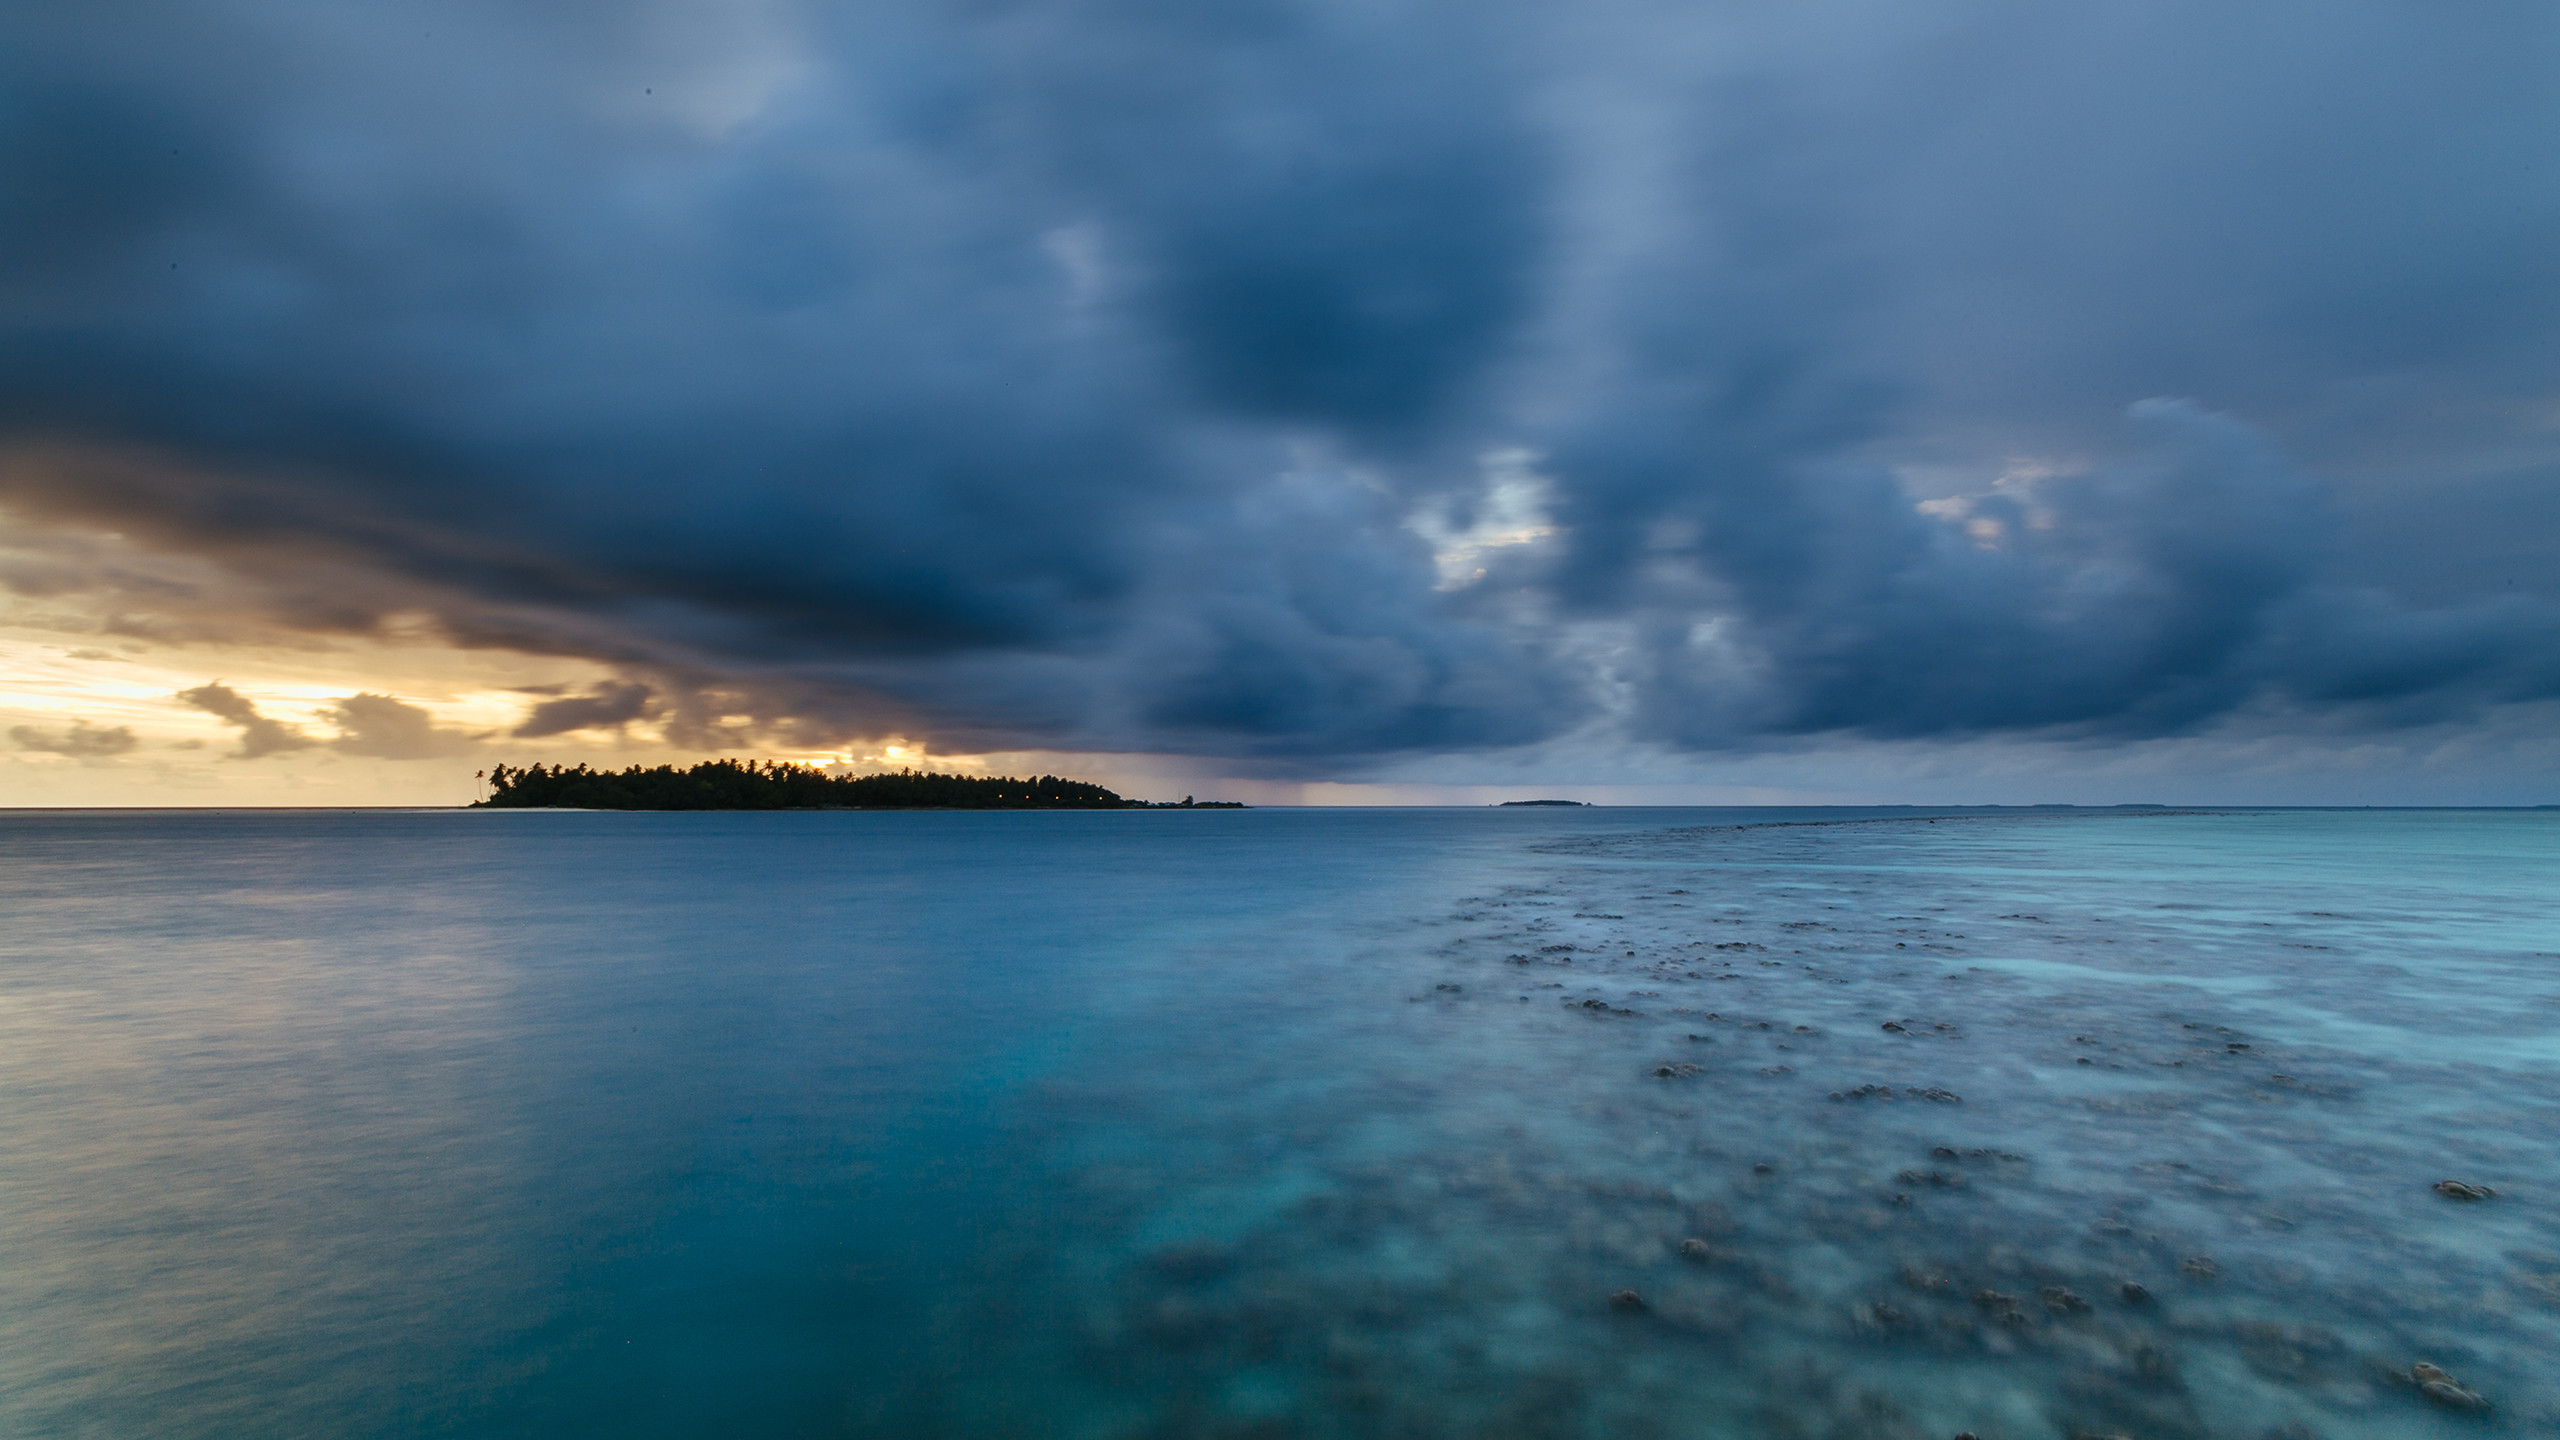 wallpaper, pebble, beach, widescreen, rating, maldiviansunset